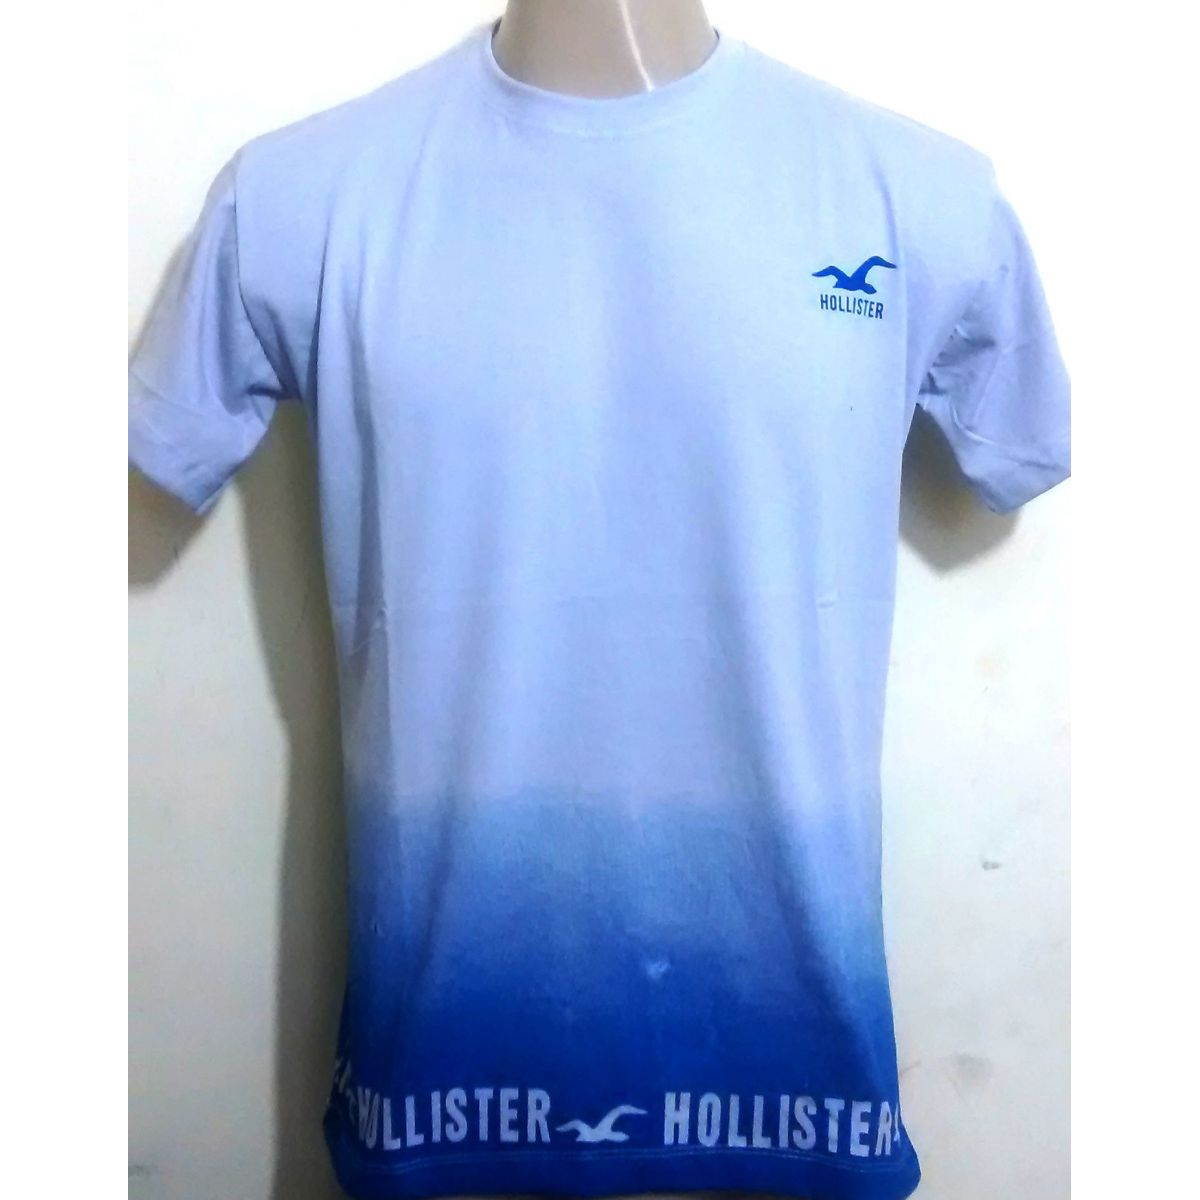 Kit C/ 30 Camisetas Masculinas Degrade Diversas Marcas